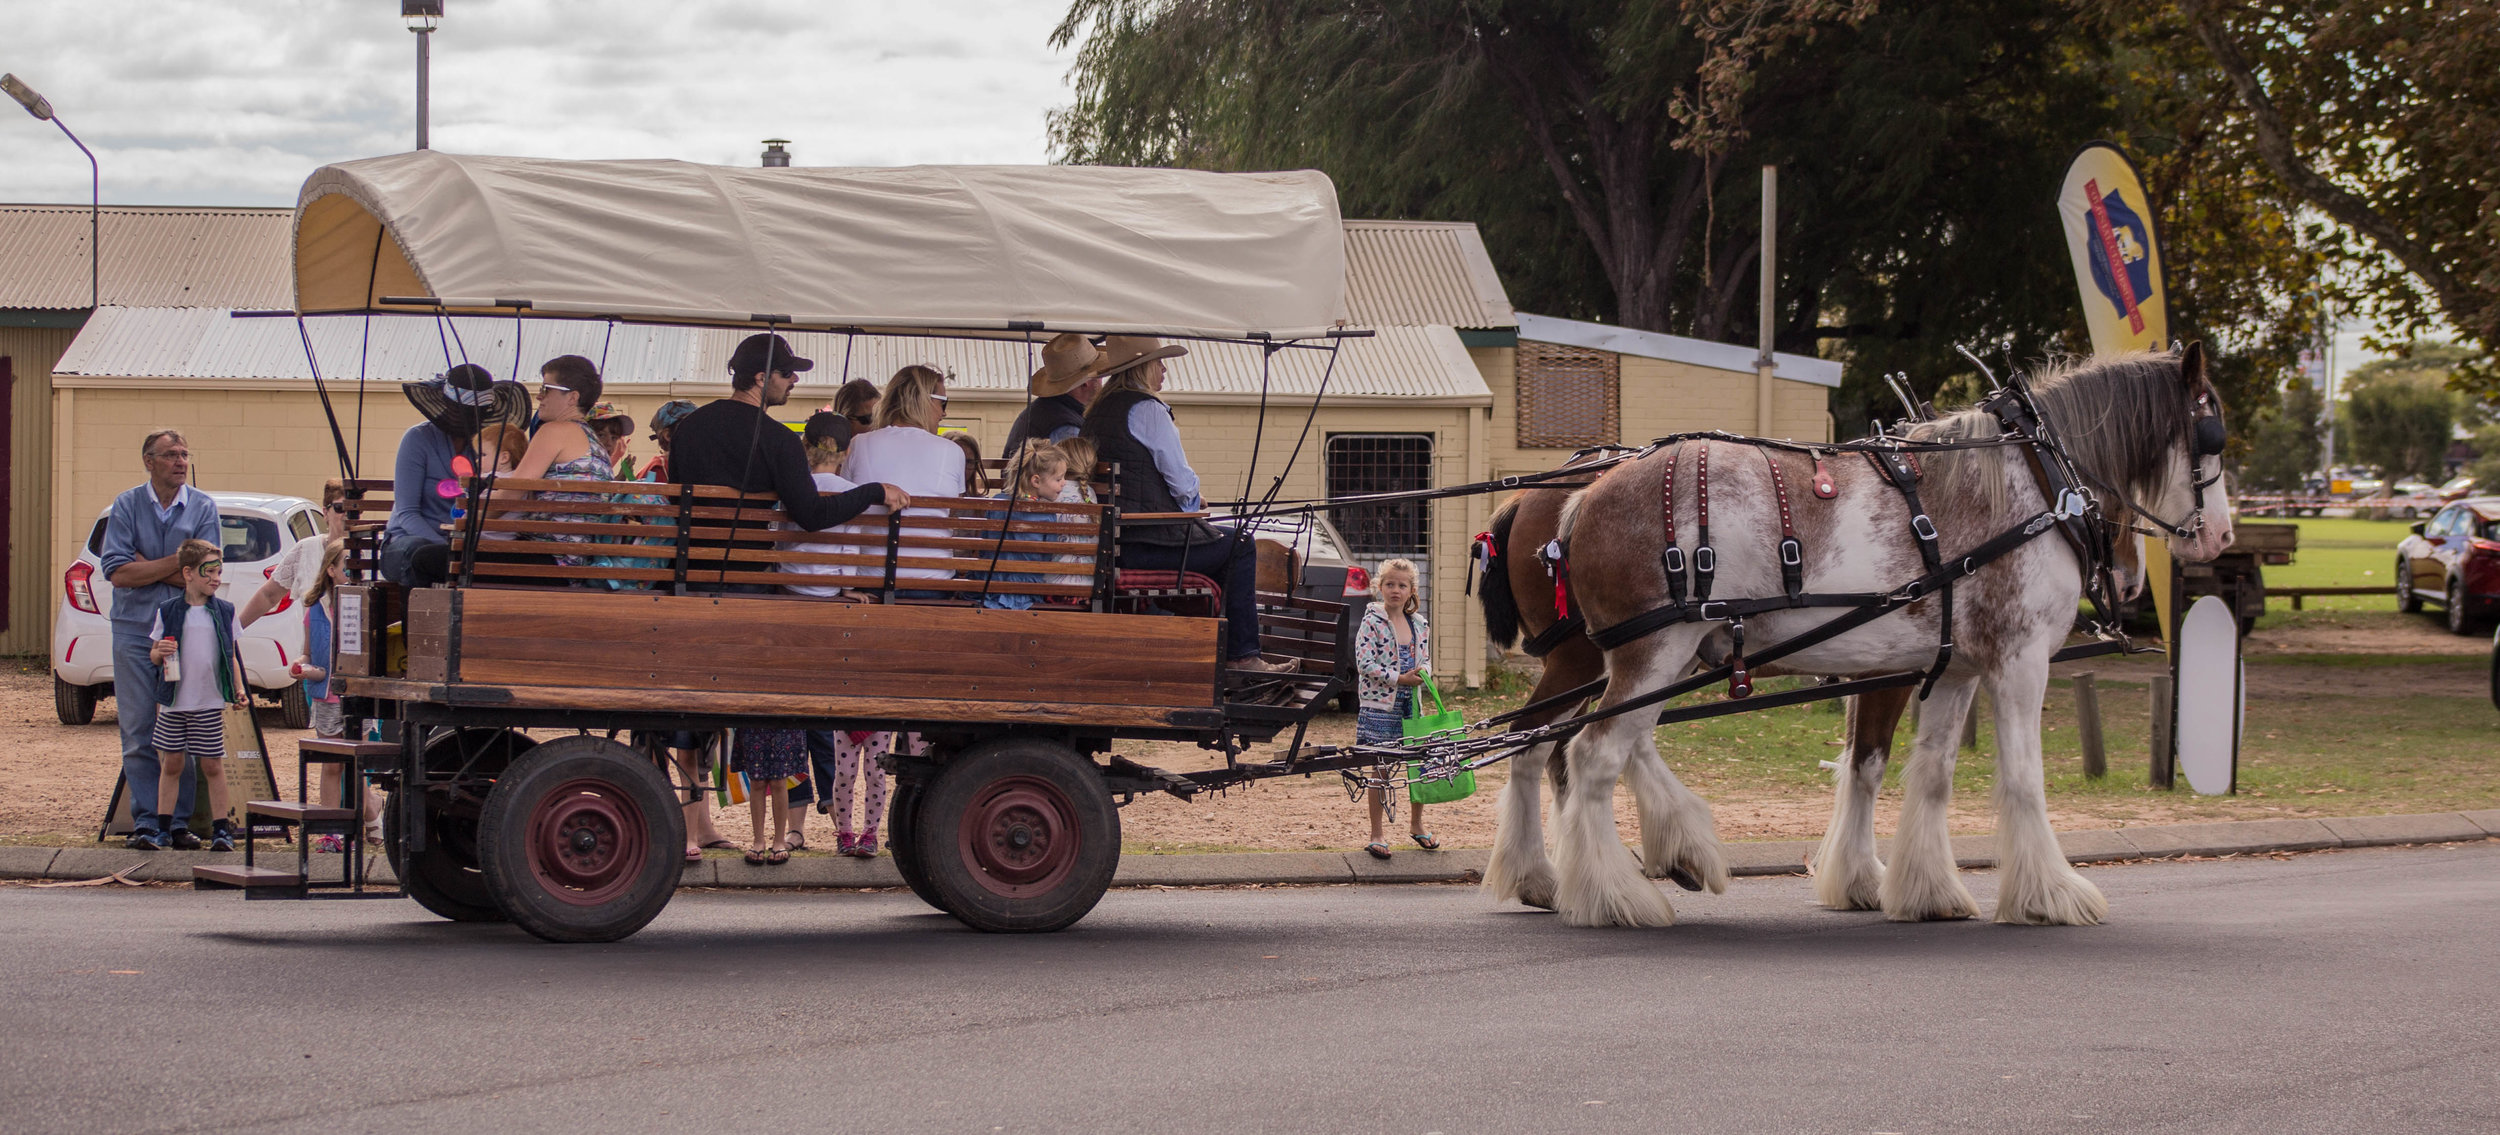 Wagon RIdes - Wagon Rides.jpg